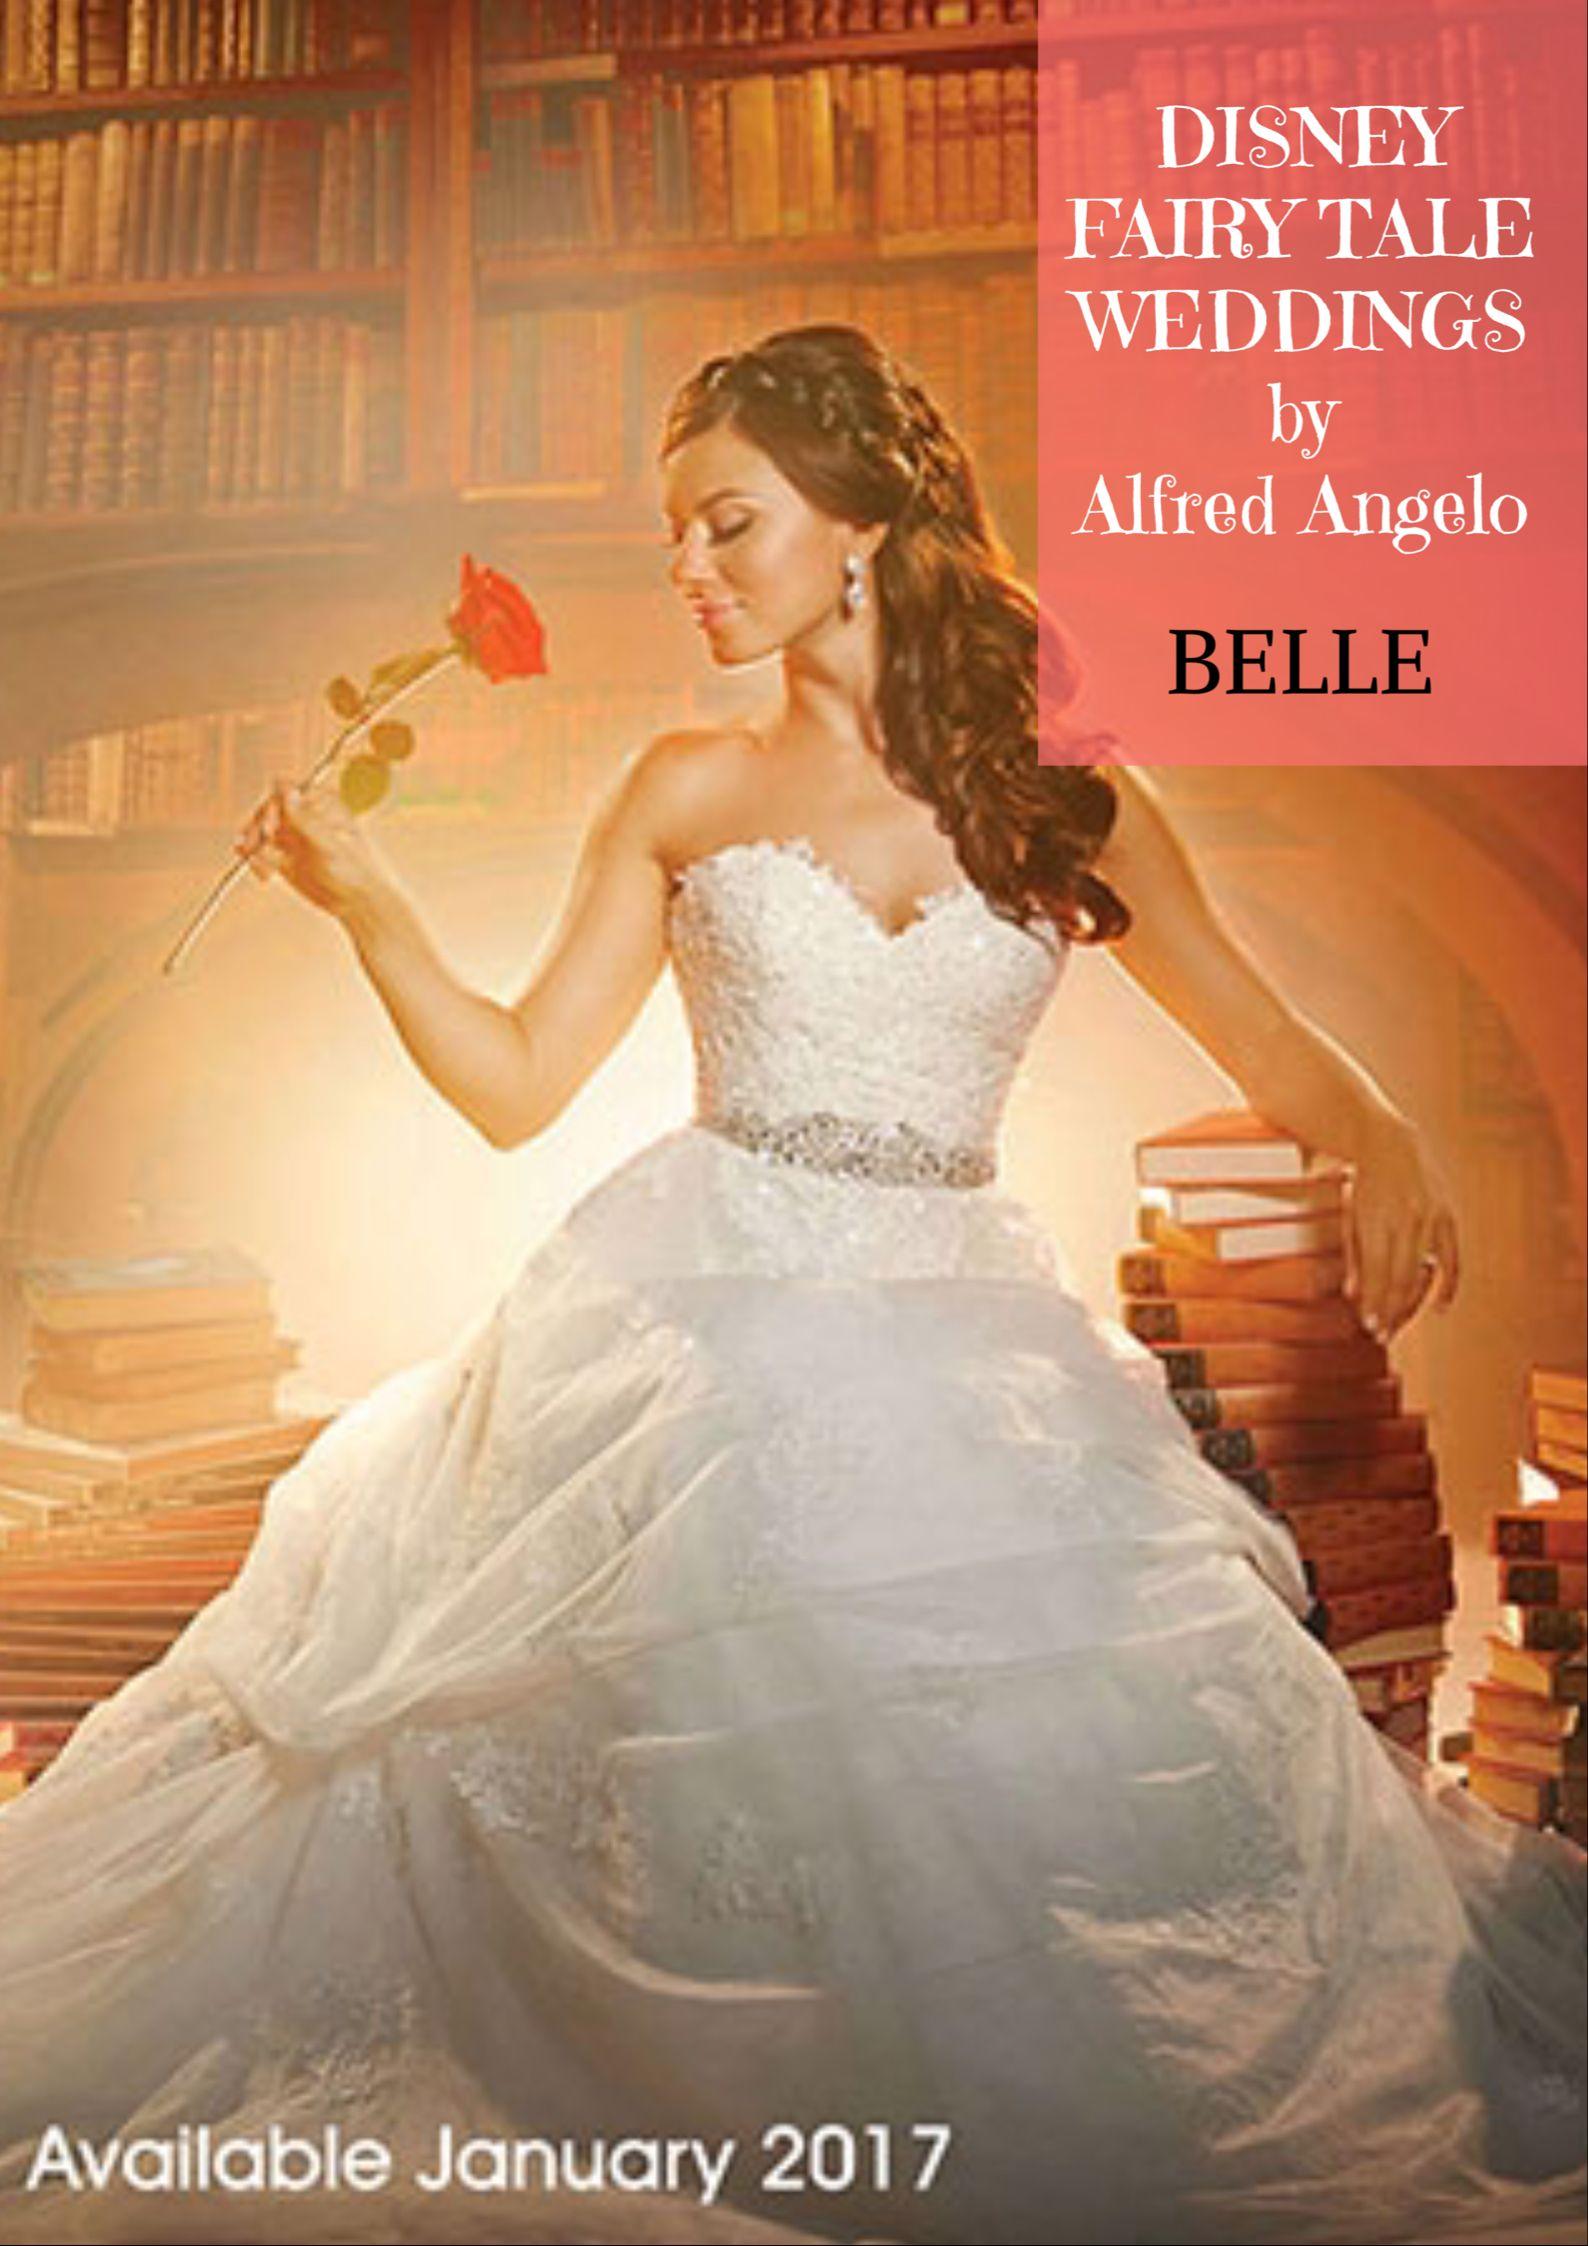 Disney Princess Belle Wedding Dress Design For 2017